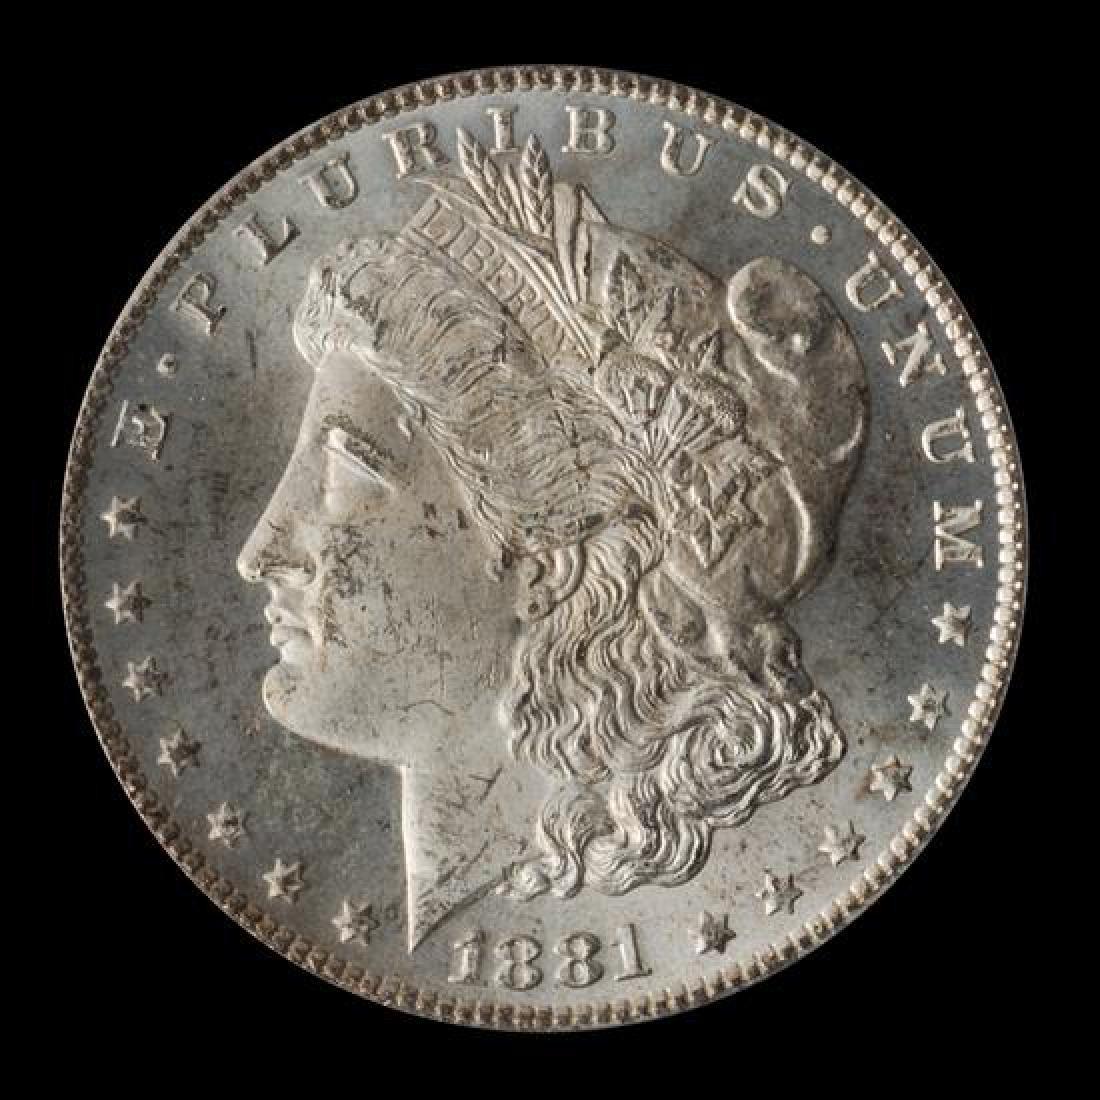 A United States 1881-CC Morgan Silver Dollar Coin